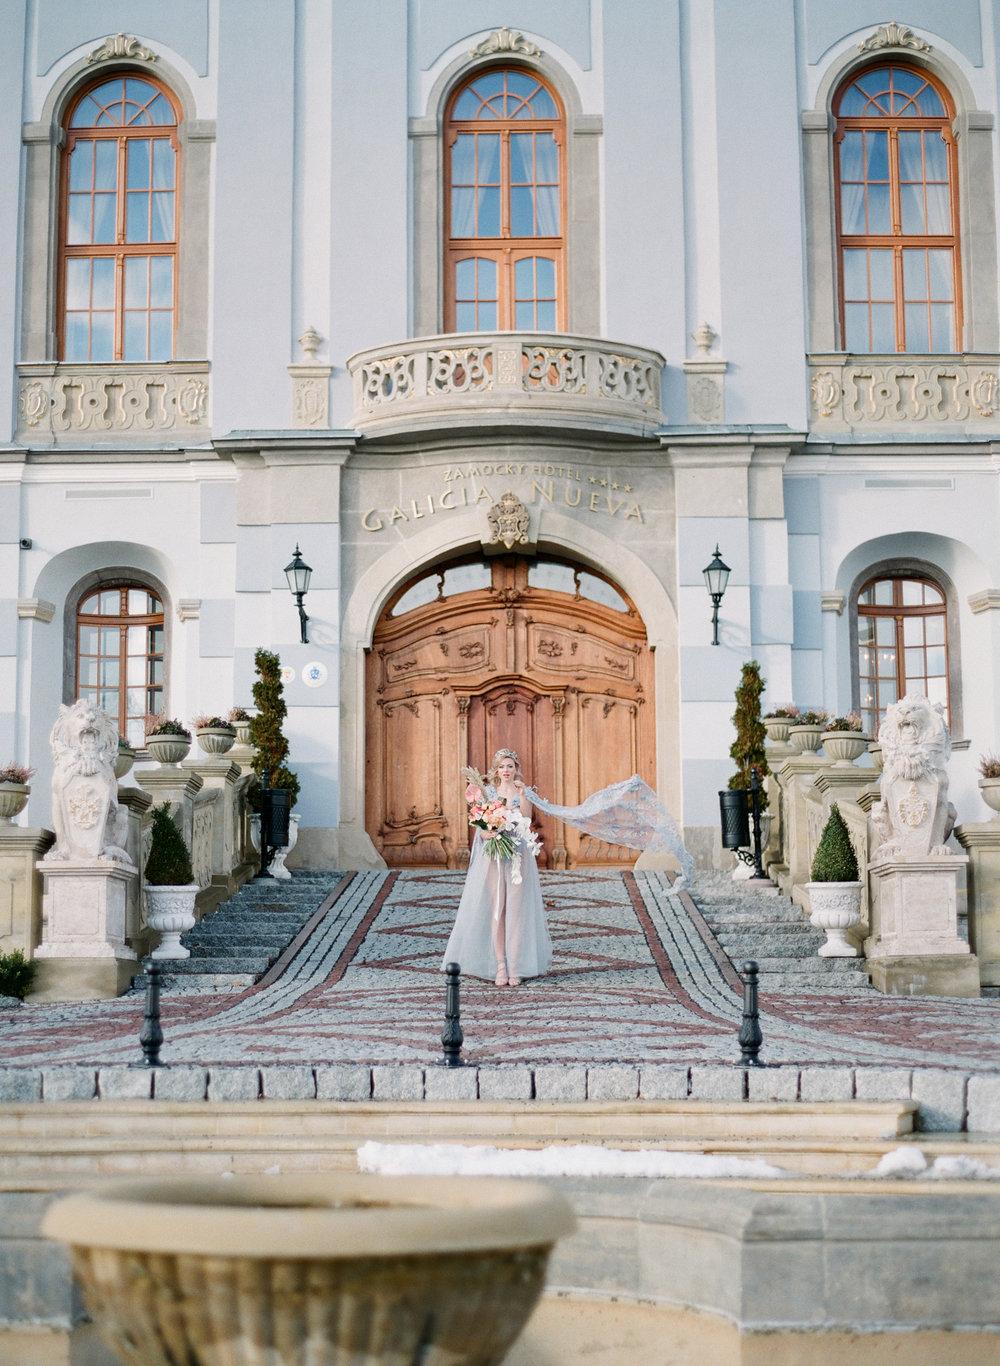 Galicia_Nueva_wedding_editorial_nikol_bodnarova_zmensene_108.JPG